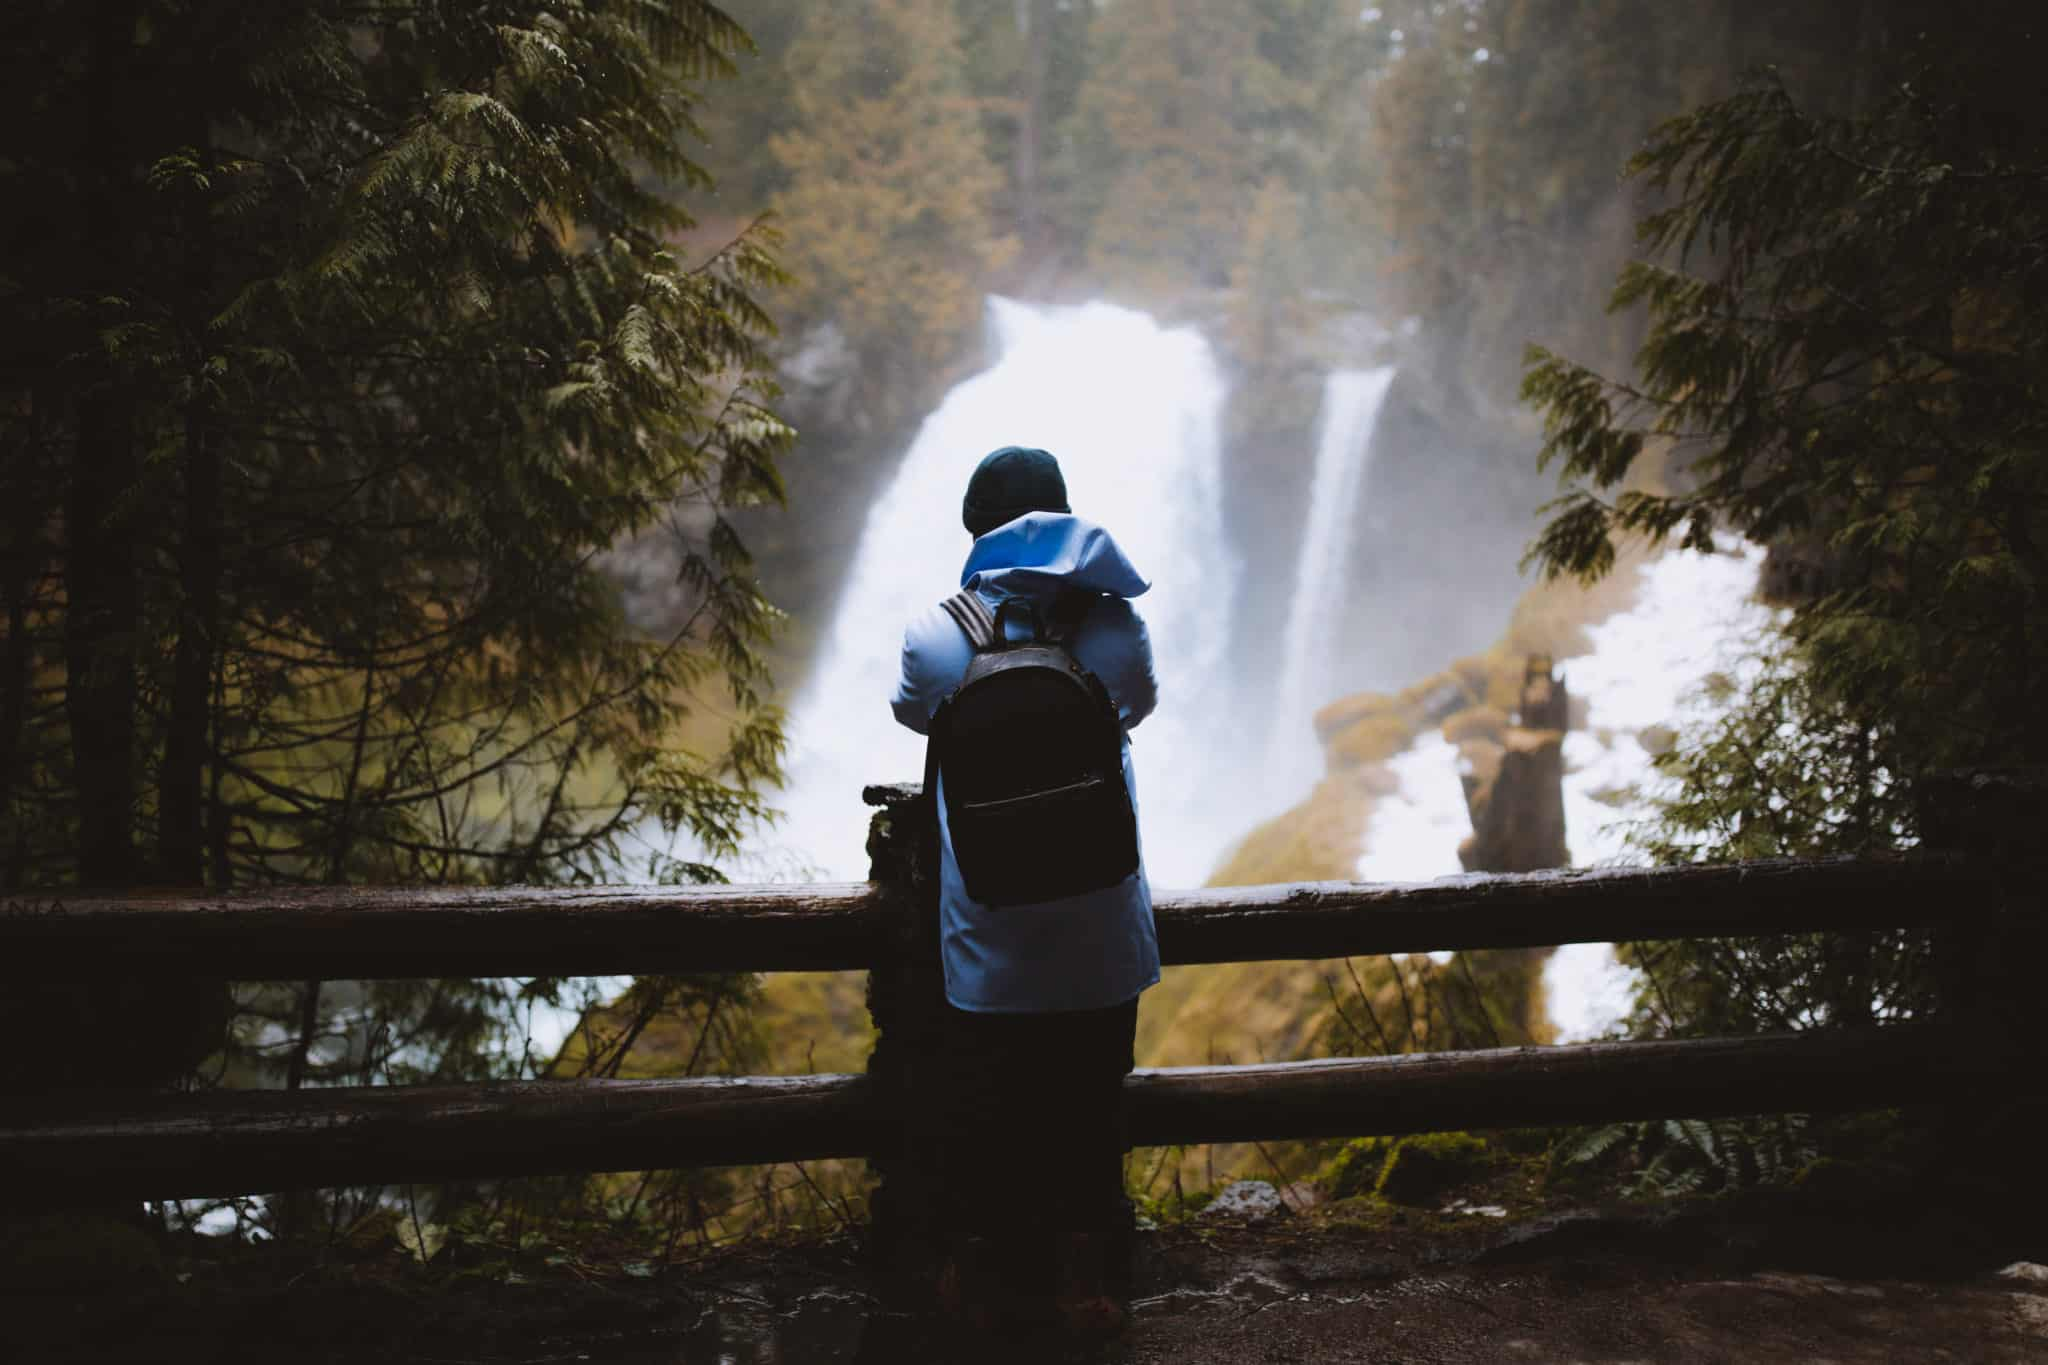 Waterfalls in Oregon - Koosah Falls